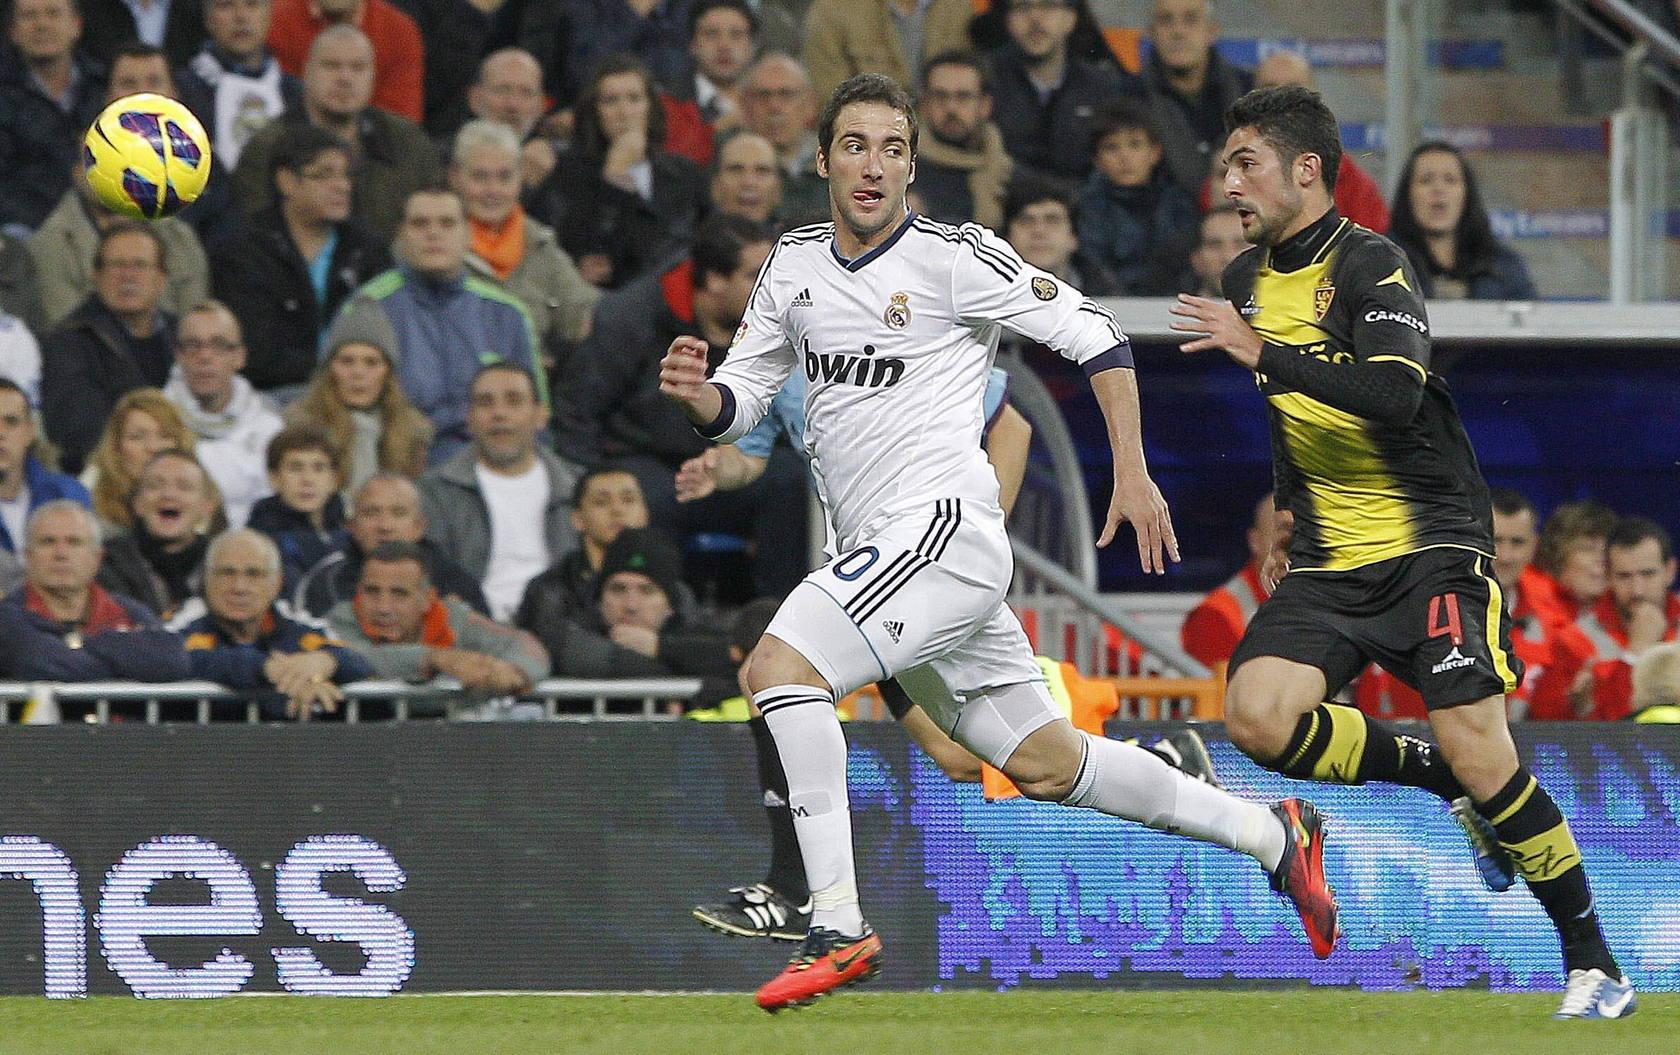 Real Madrid-Zaragoza